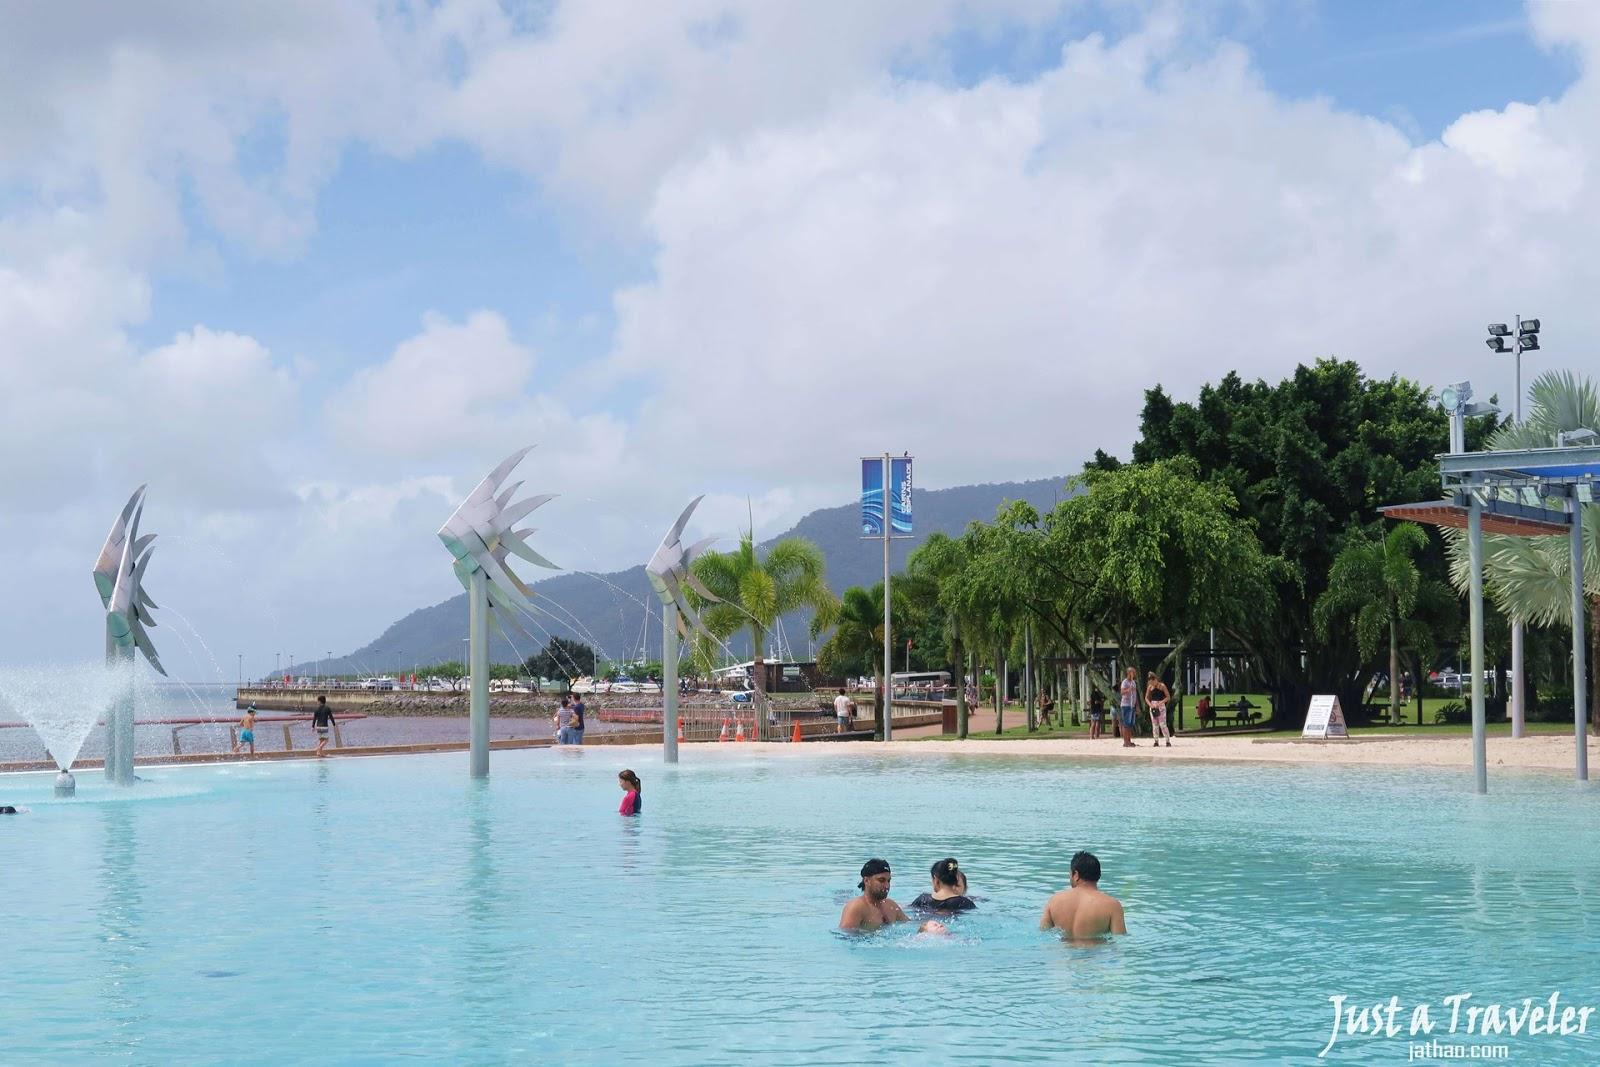 凱恩斯-景點-推薦-海濱泳池-濱道潟湖-旅遊-自由行-澳洲-Cairns-Tourist-Attraction-Esplanade-Lagoon-Travel-Australia